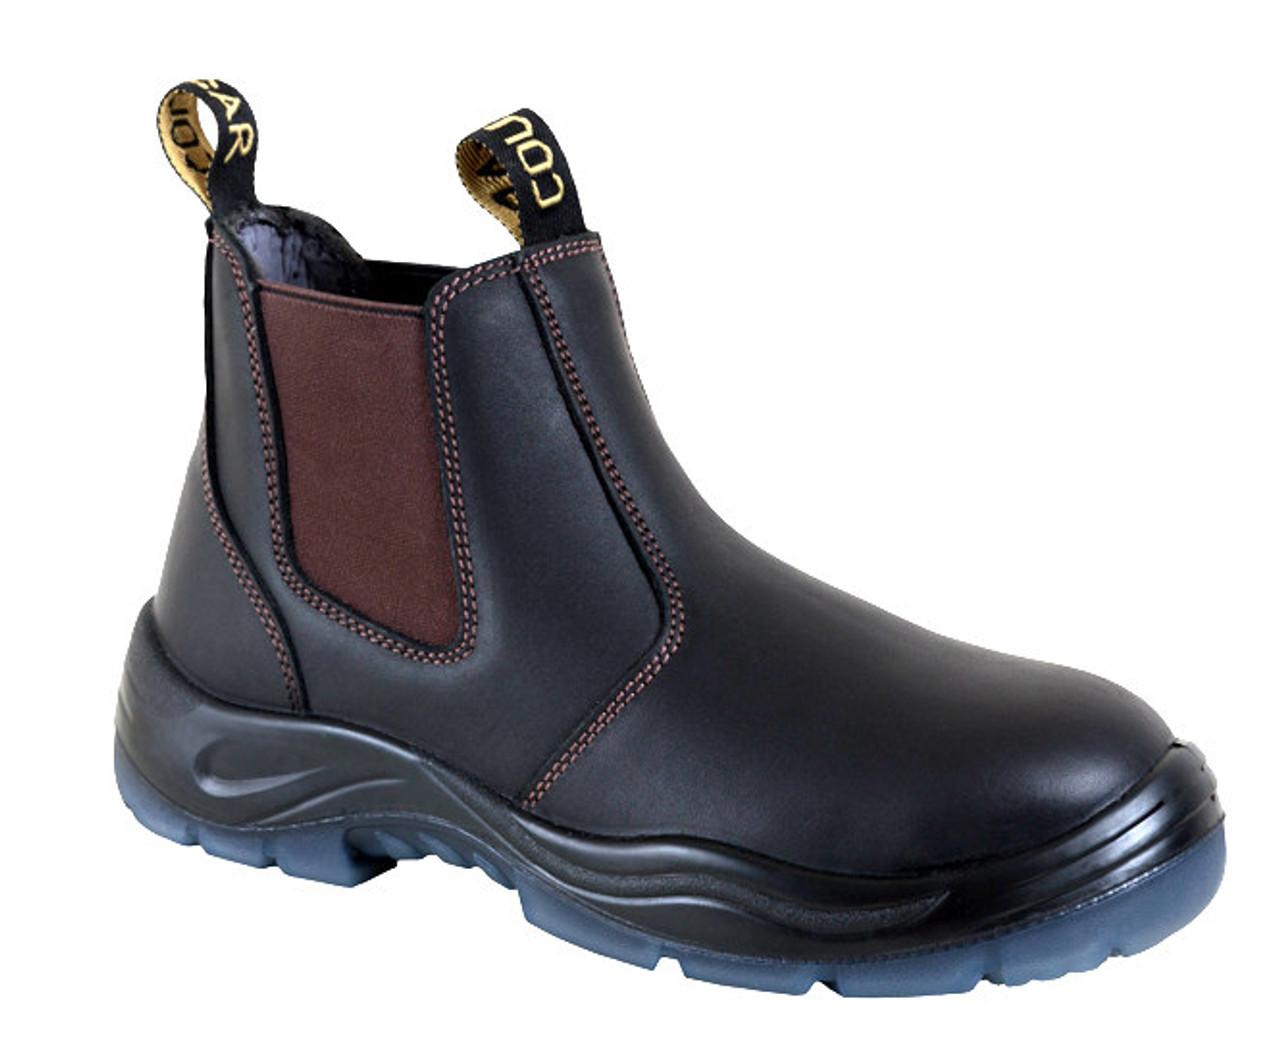 0cbeca1bc55 Cougar Jersey Elastic Sided Work Boots with Steel Cap - Koolstuff ...